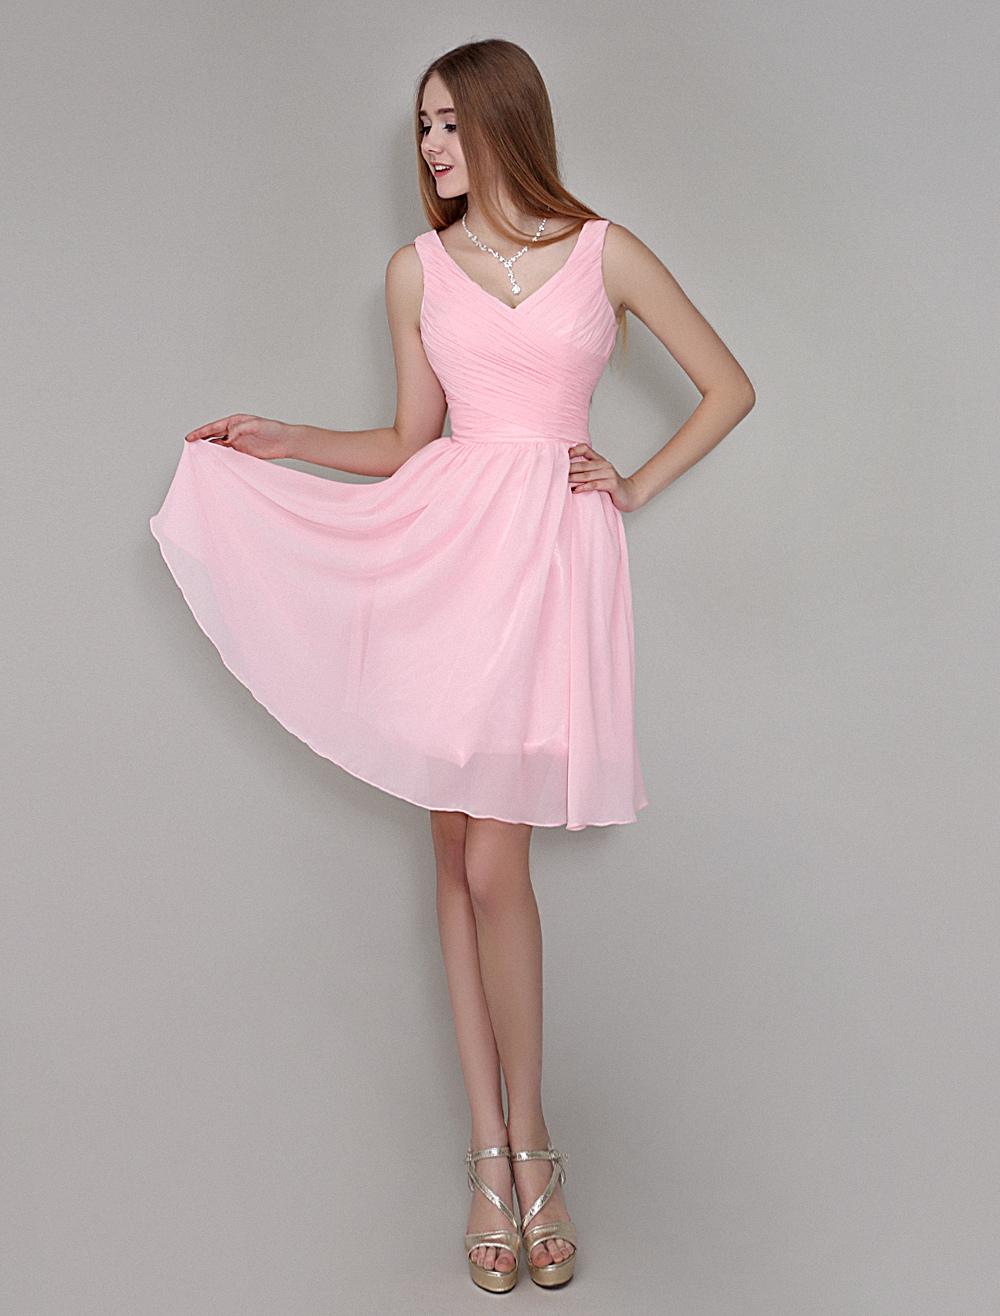 Blush Pink Knee-Length Chiffon Bridesmaid Dress